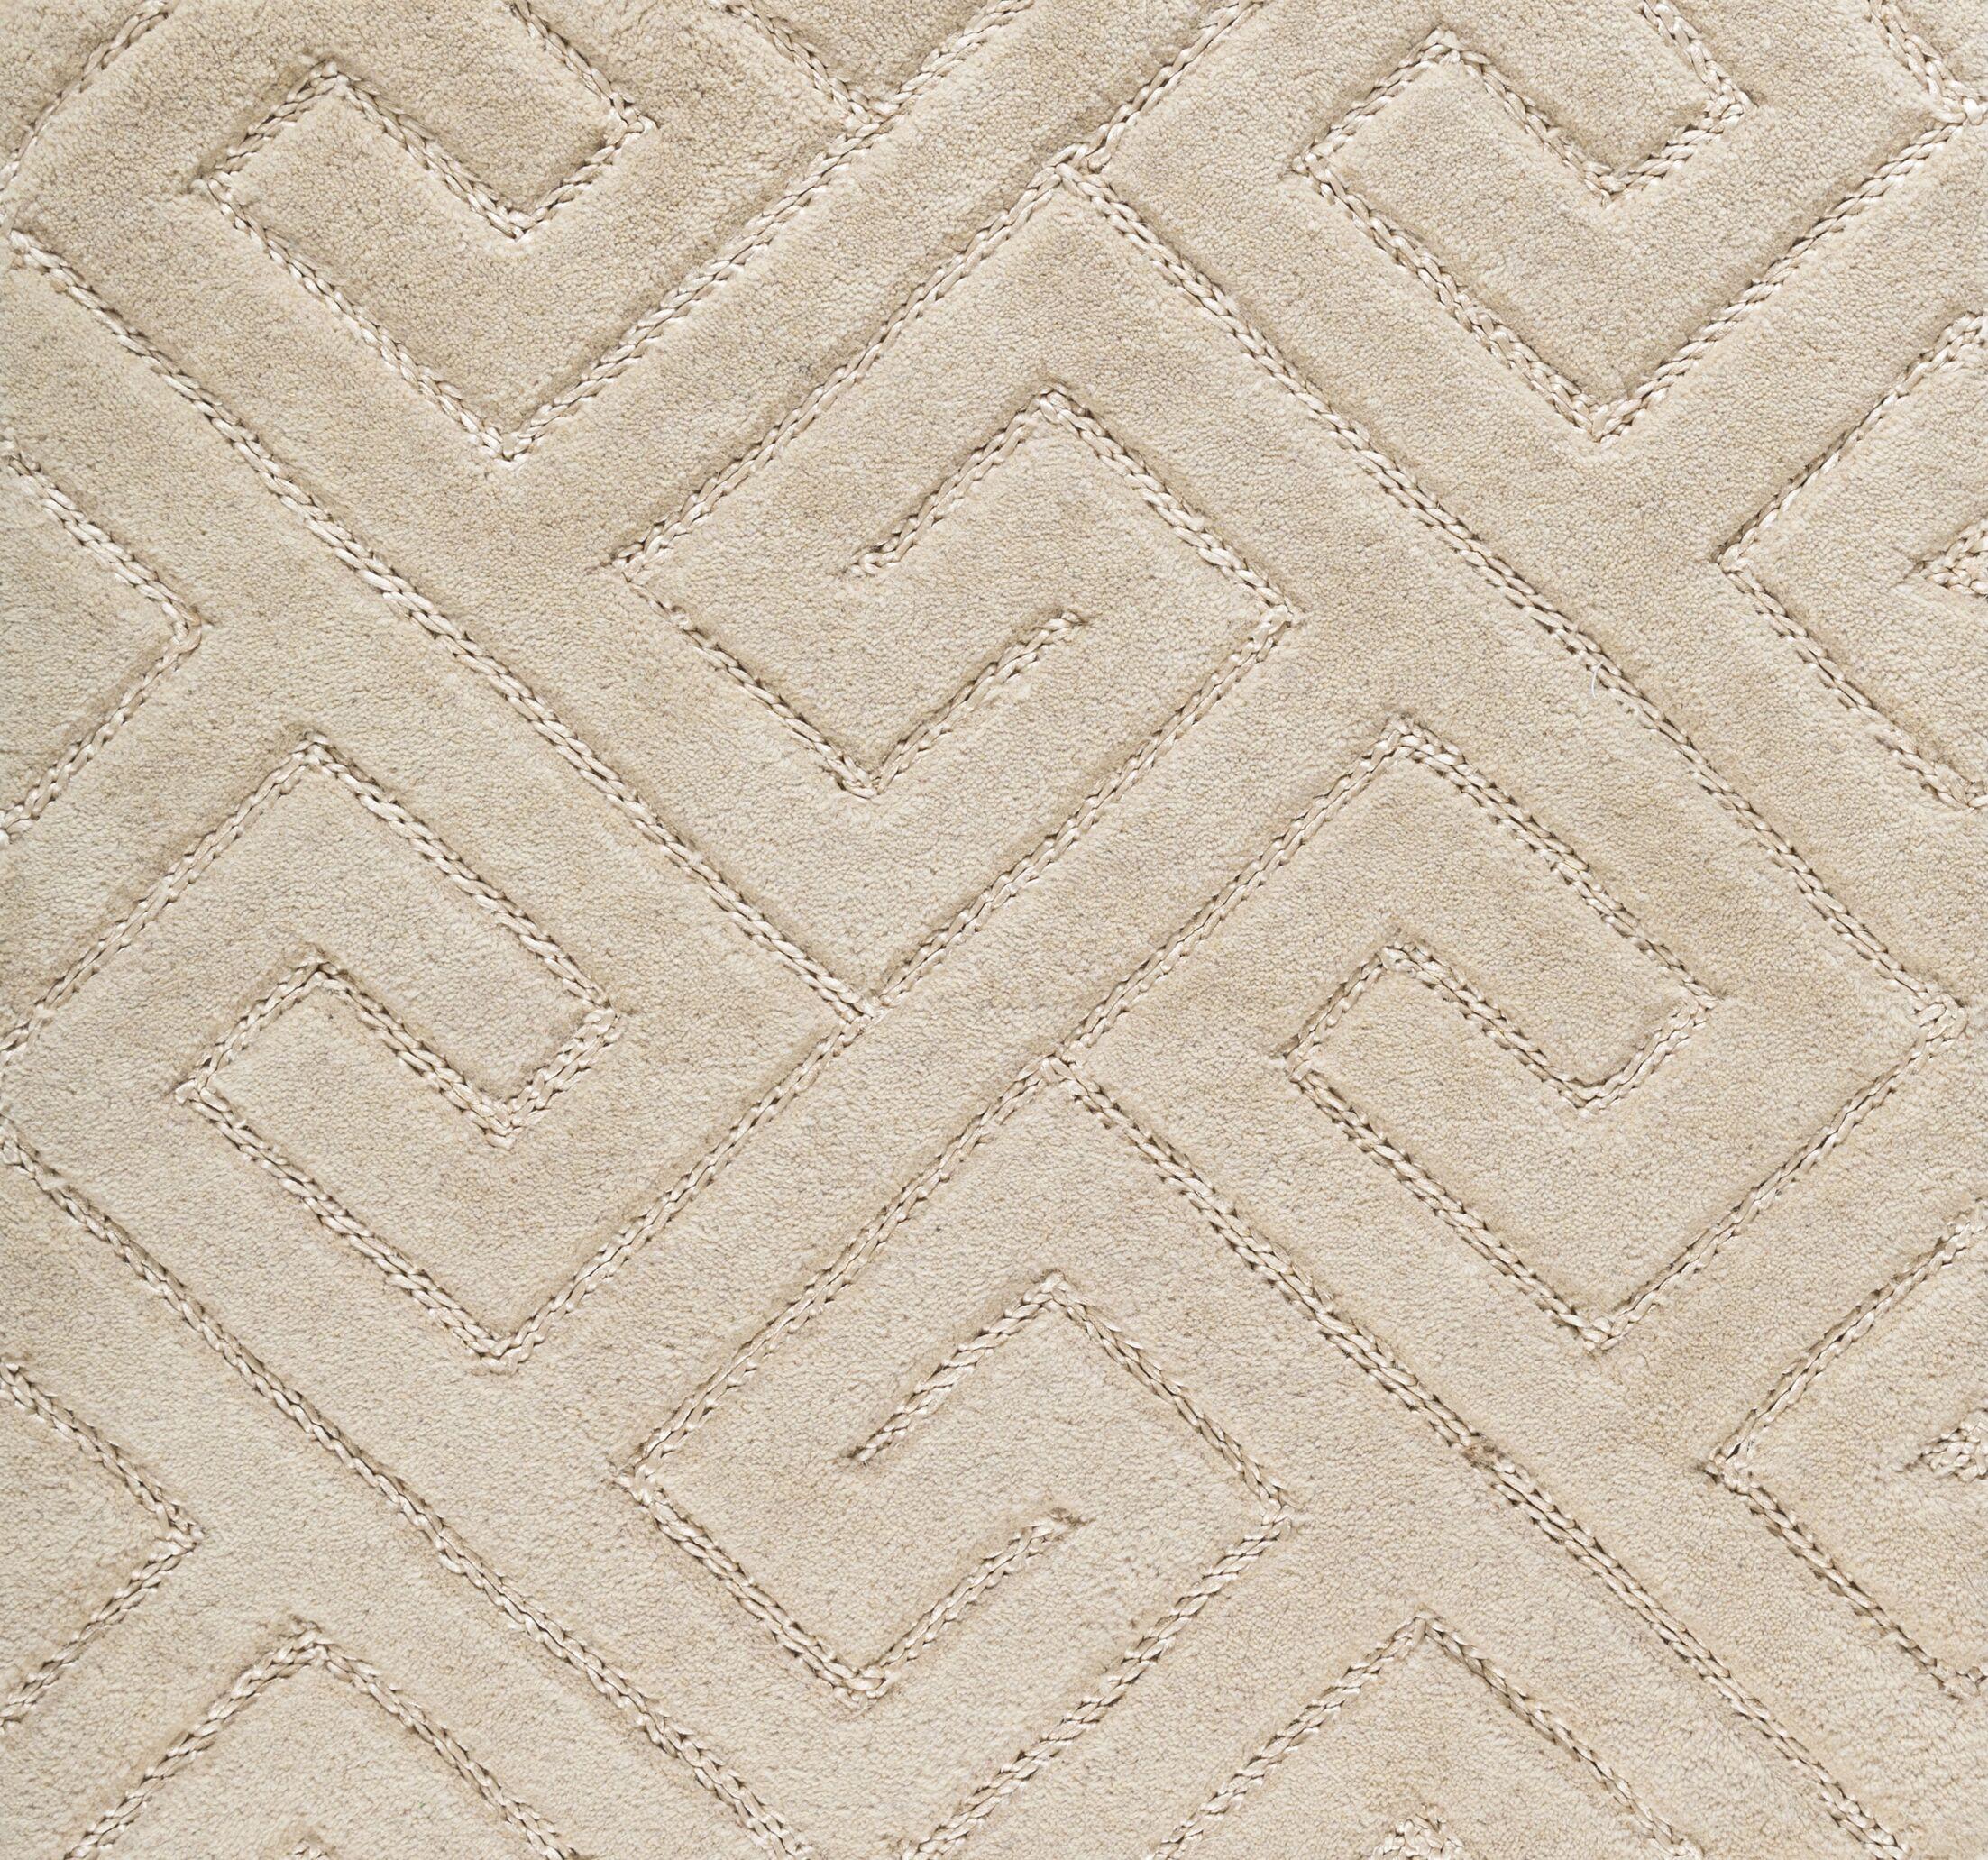 Hereford Geometric Hand-Tufted Beige Area Rug Rug Size: Rectangle 8' x 10'